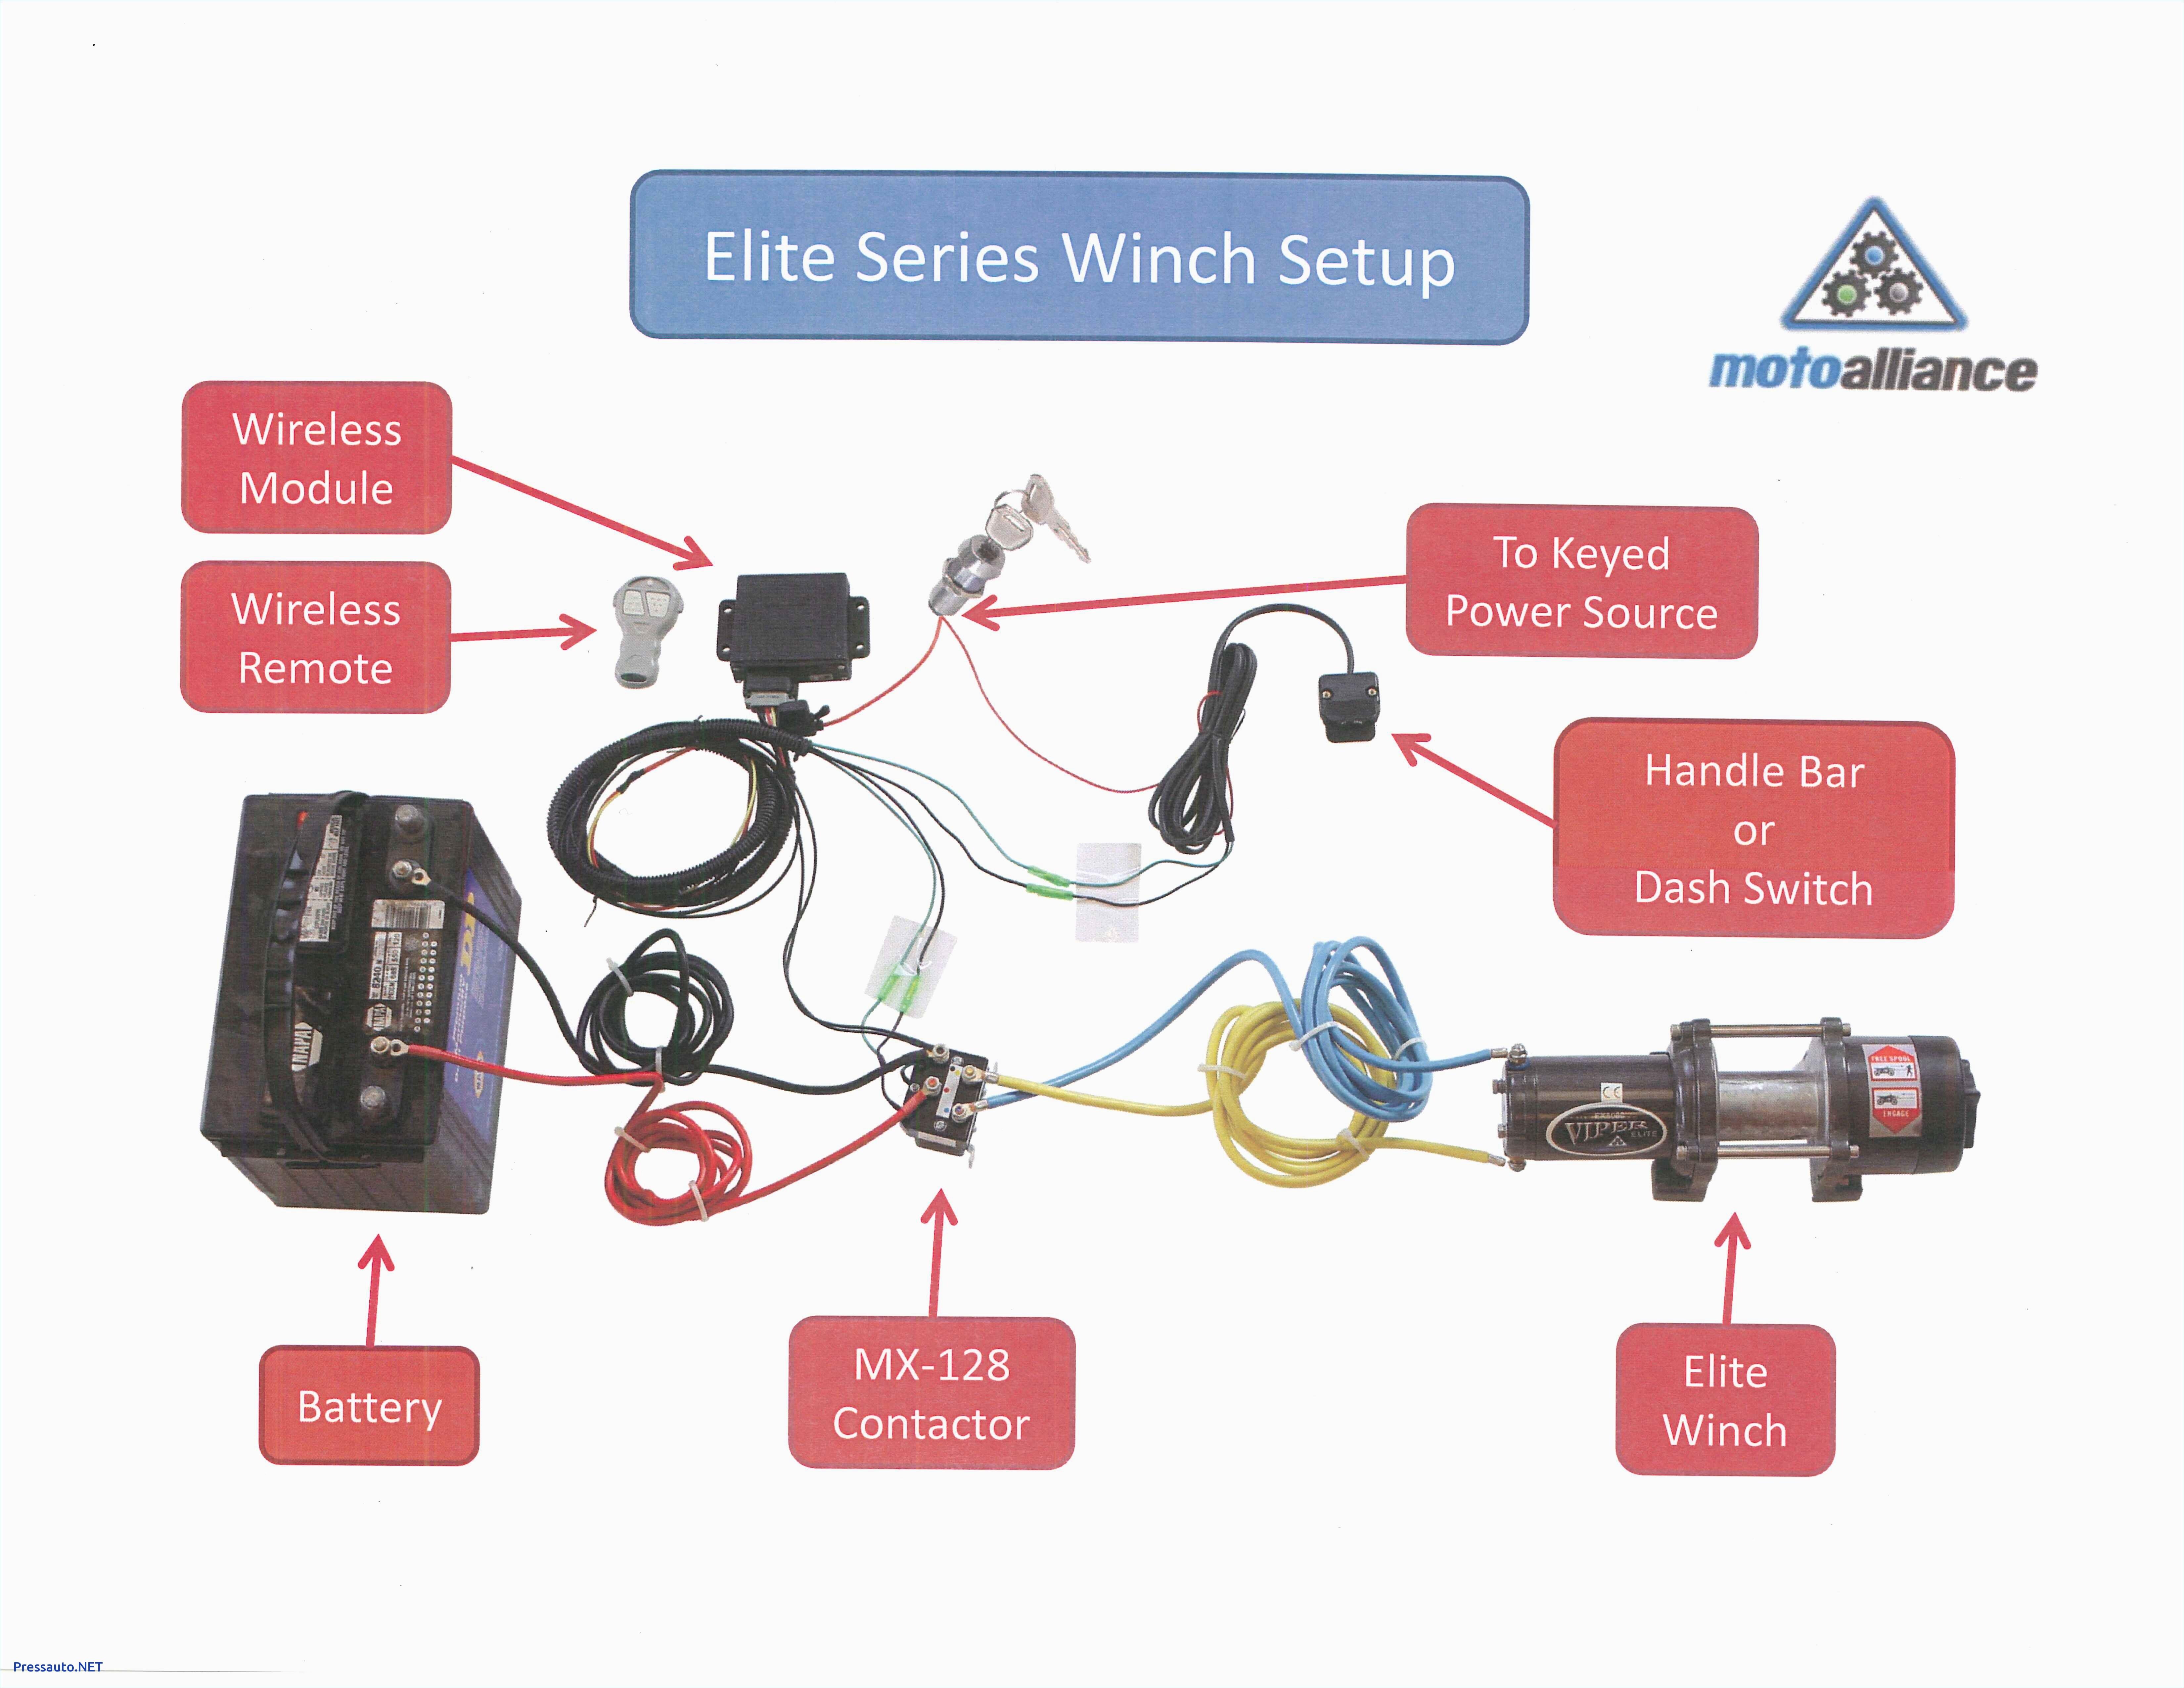 warn winch switch wiring wiring diagram paper atv winch switch wiring diagram atv winch switch wiring diagram